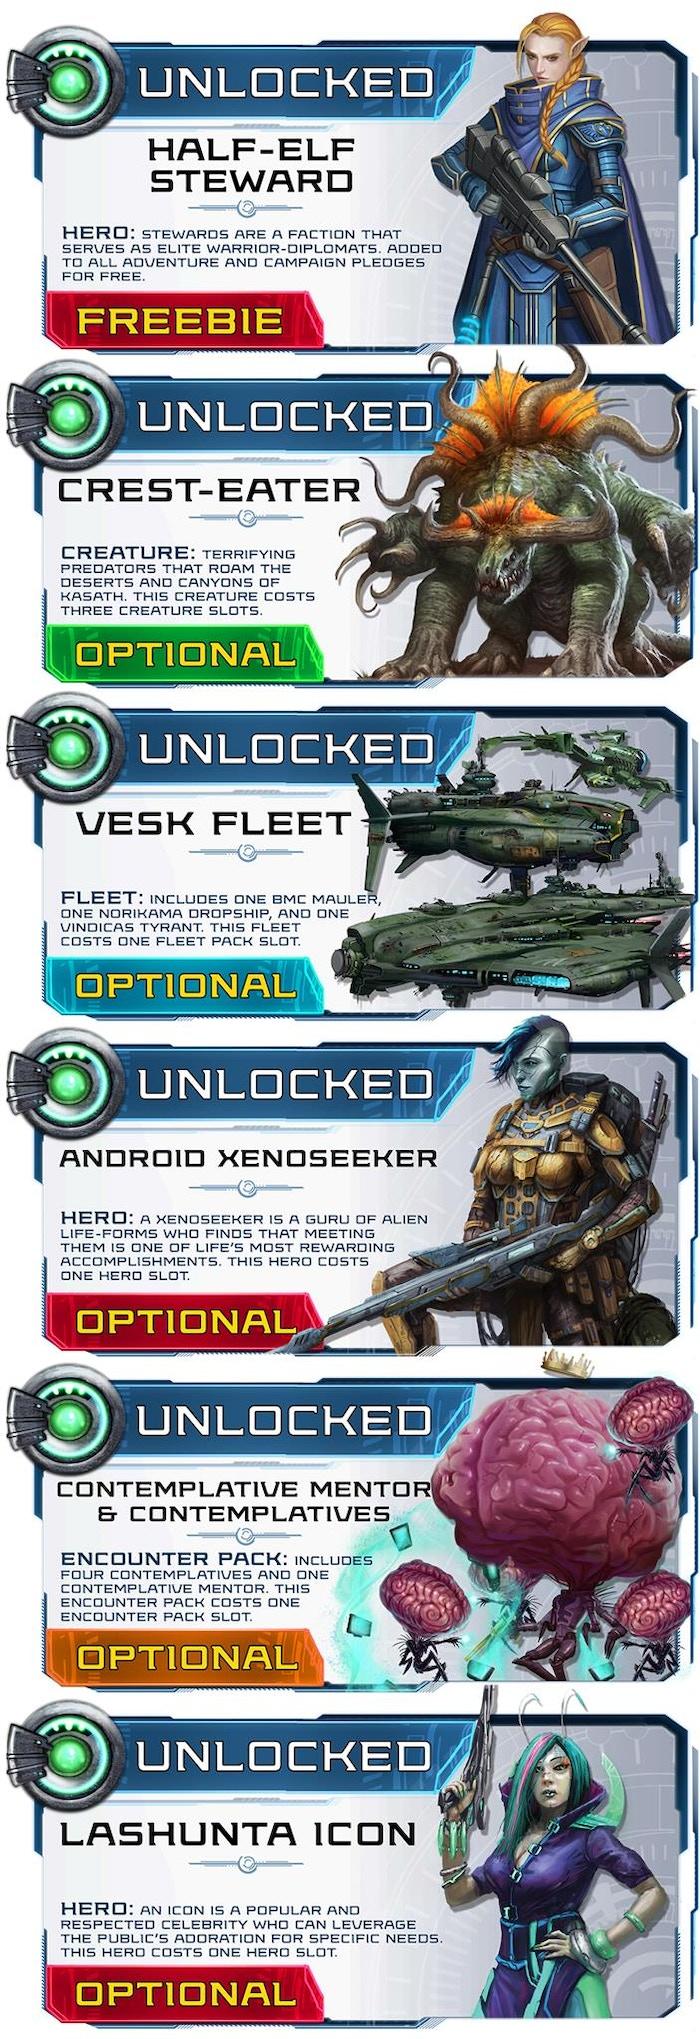 Starfinder Masterclass Miniatures by Ninja Division